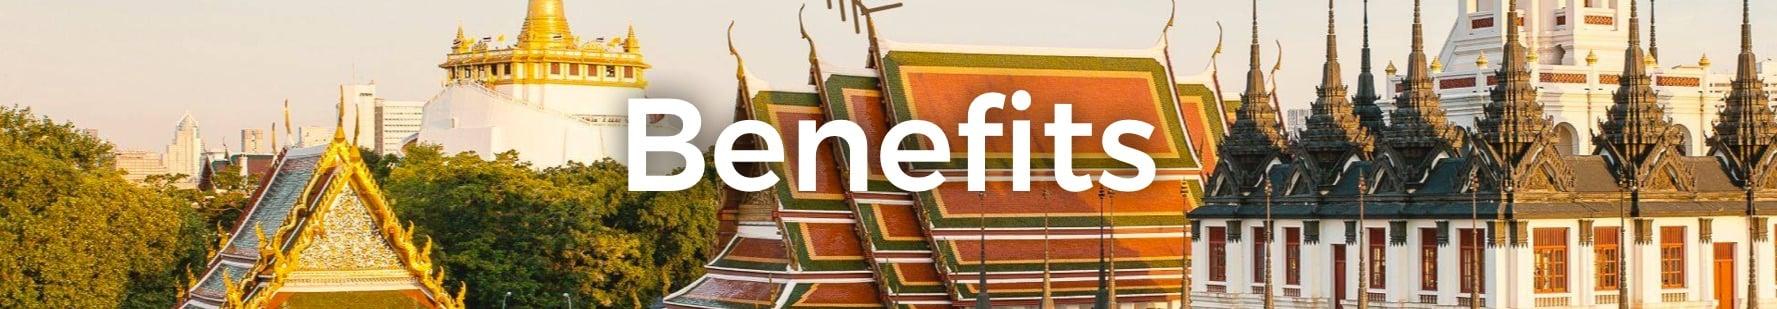 "alt=""Benefits"""